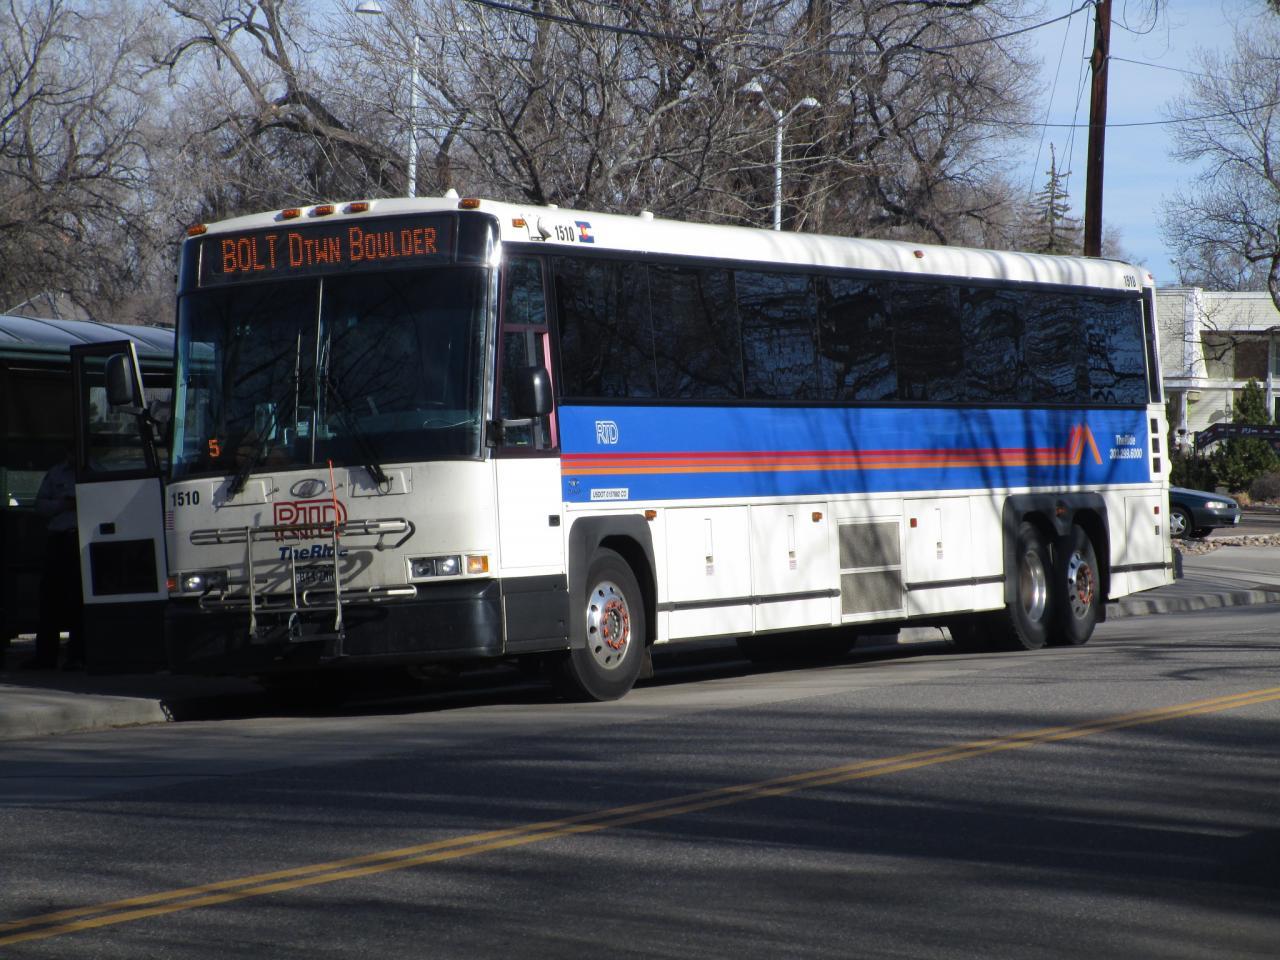 Denver RTD - Page 6 - Western US - Canadian Public Transit